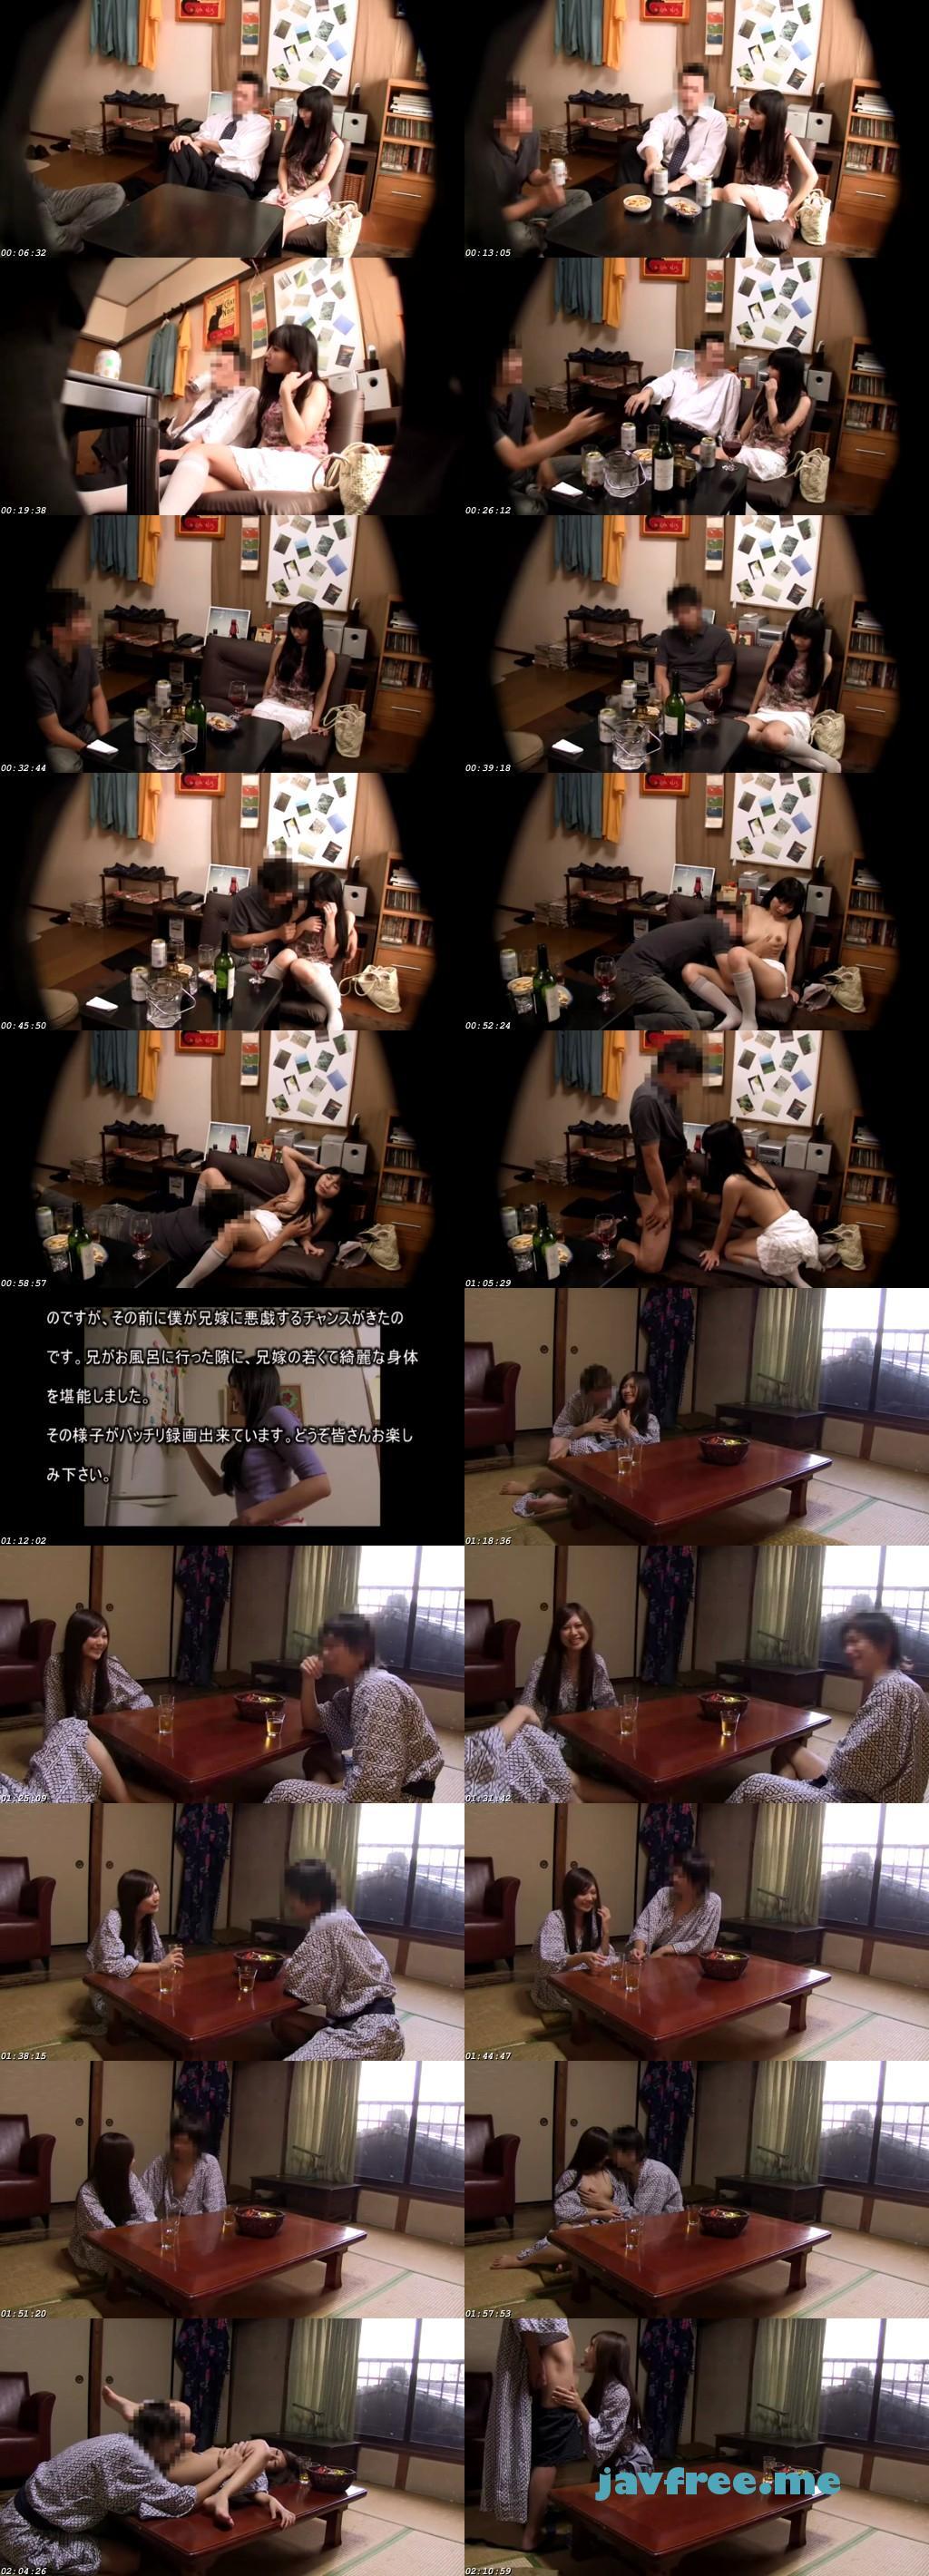 [KAZK-024] 家庭内淫行作戦 好評2作品ノーカット完全収録盤 兄嫁がスケベな事はわかっていたから… - image KAZK-024 on https://javfree.me